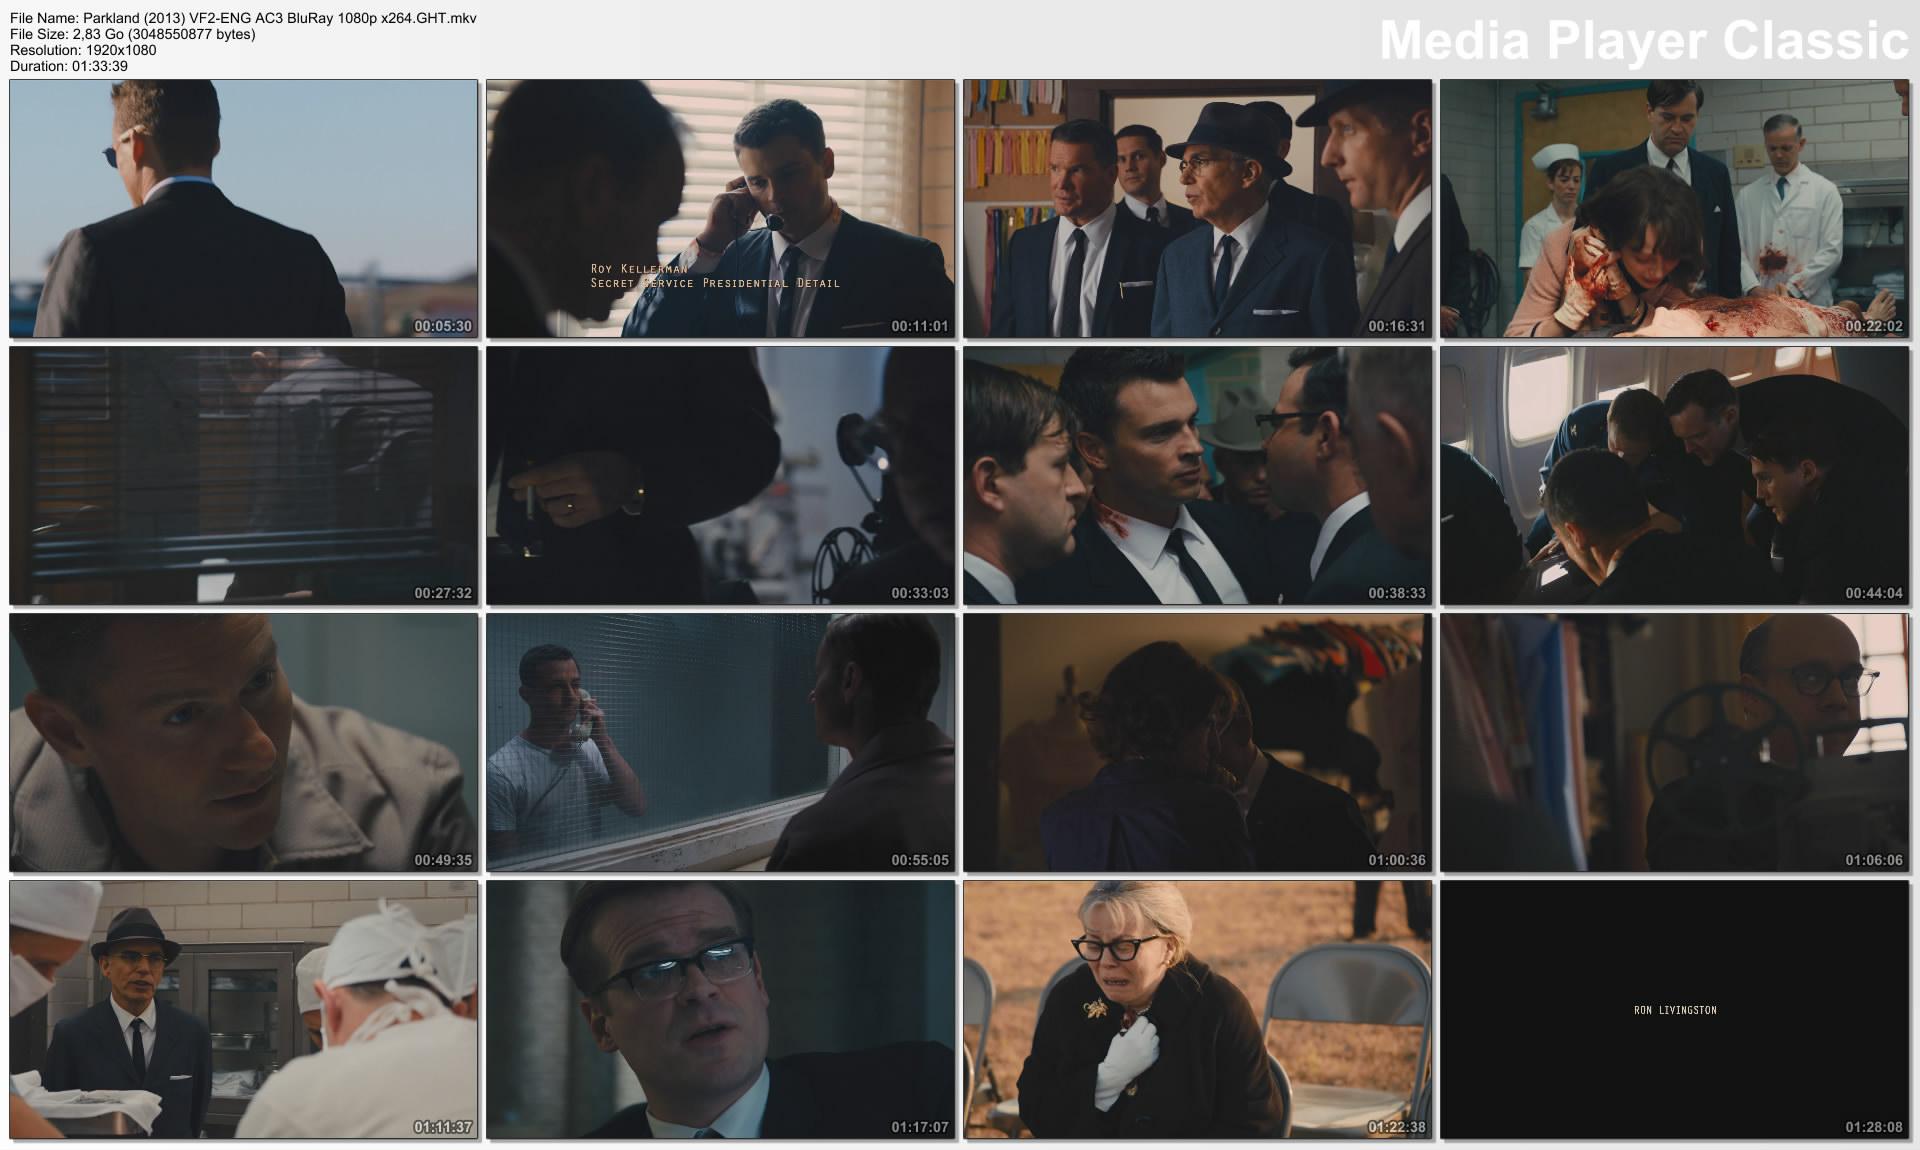 Parkland (2013) VF2-ENG AC3 BluRay 1080p x264.GHT